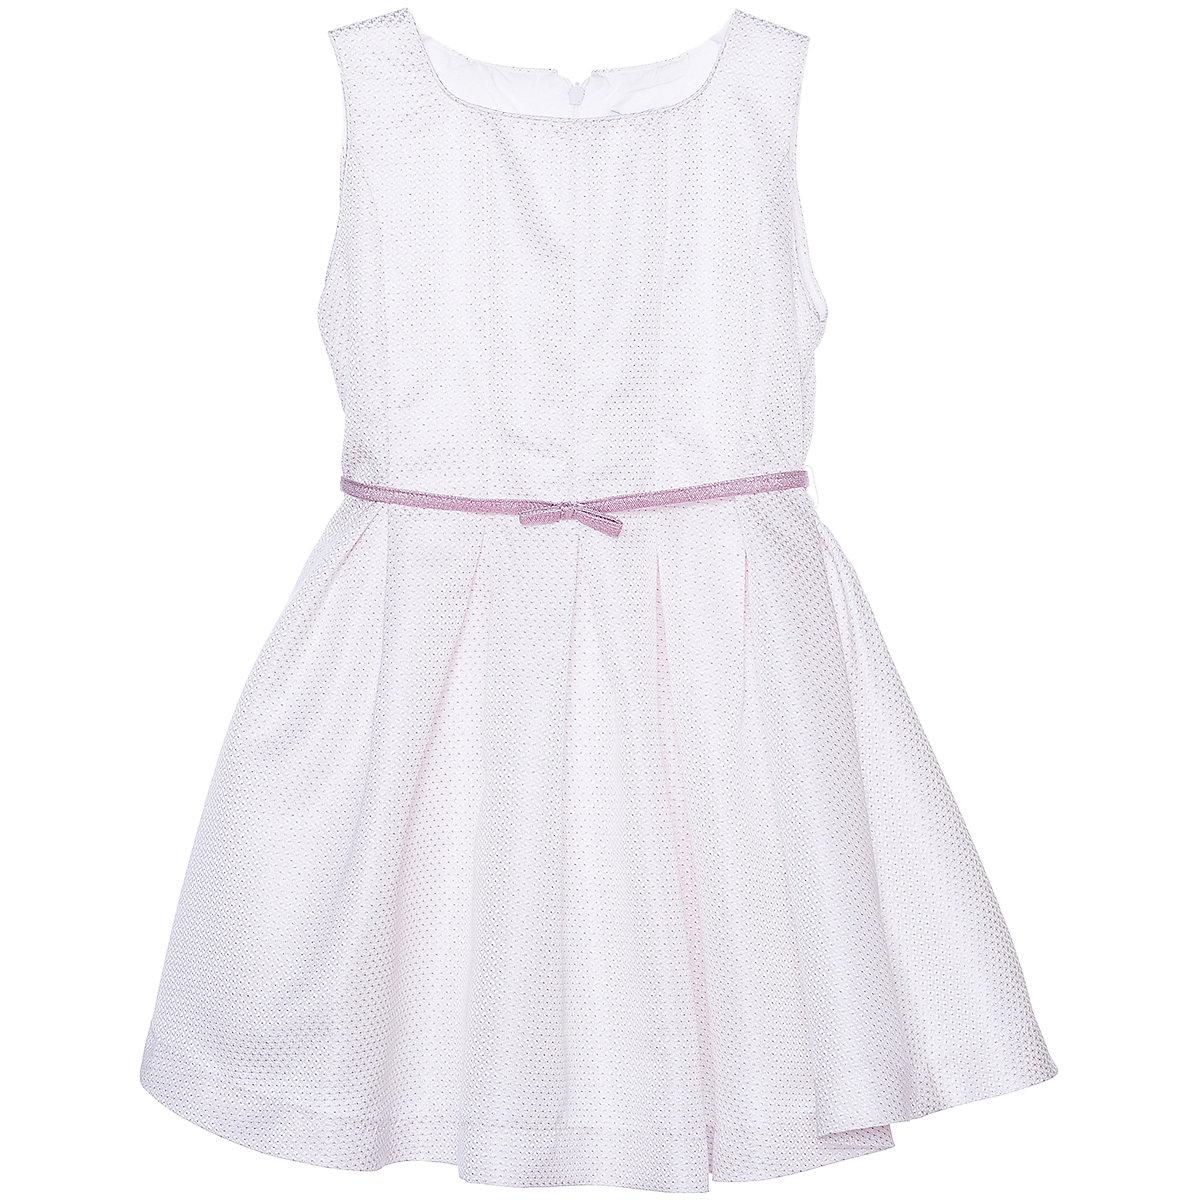 Vestidos MAYORAL 10678547 niña niños fiesta Falda plisada Rosa poliéster estilo Preppy sólido rodilla-longitud manga sin mangas